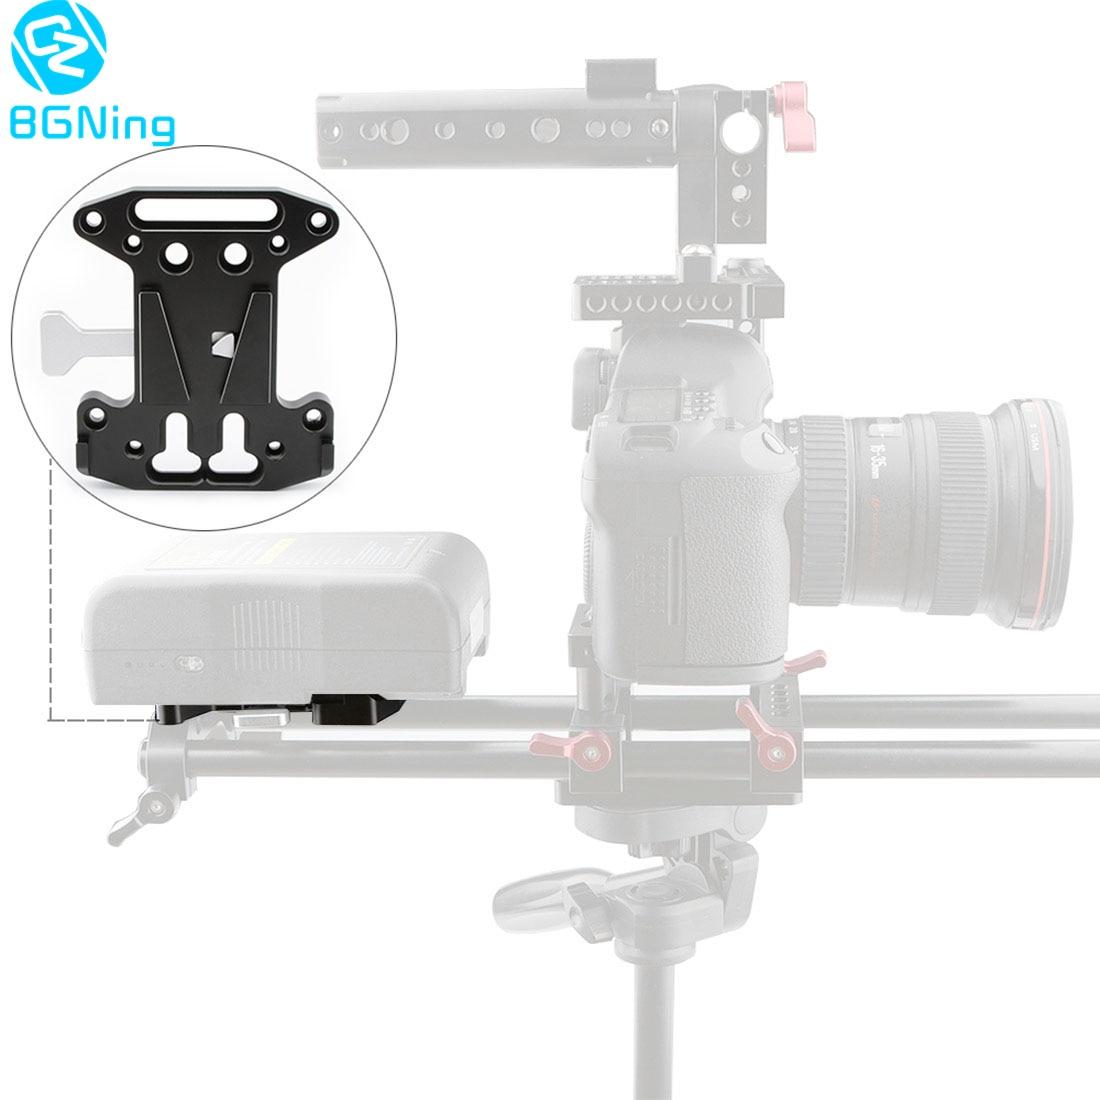 BGNing V-Lock Quick Release Battery Clamp Back Plate Mount for DJI Ronin M MX for Blackmagic URSA Mini DSLR Camera Cage Rig